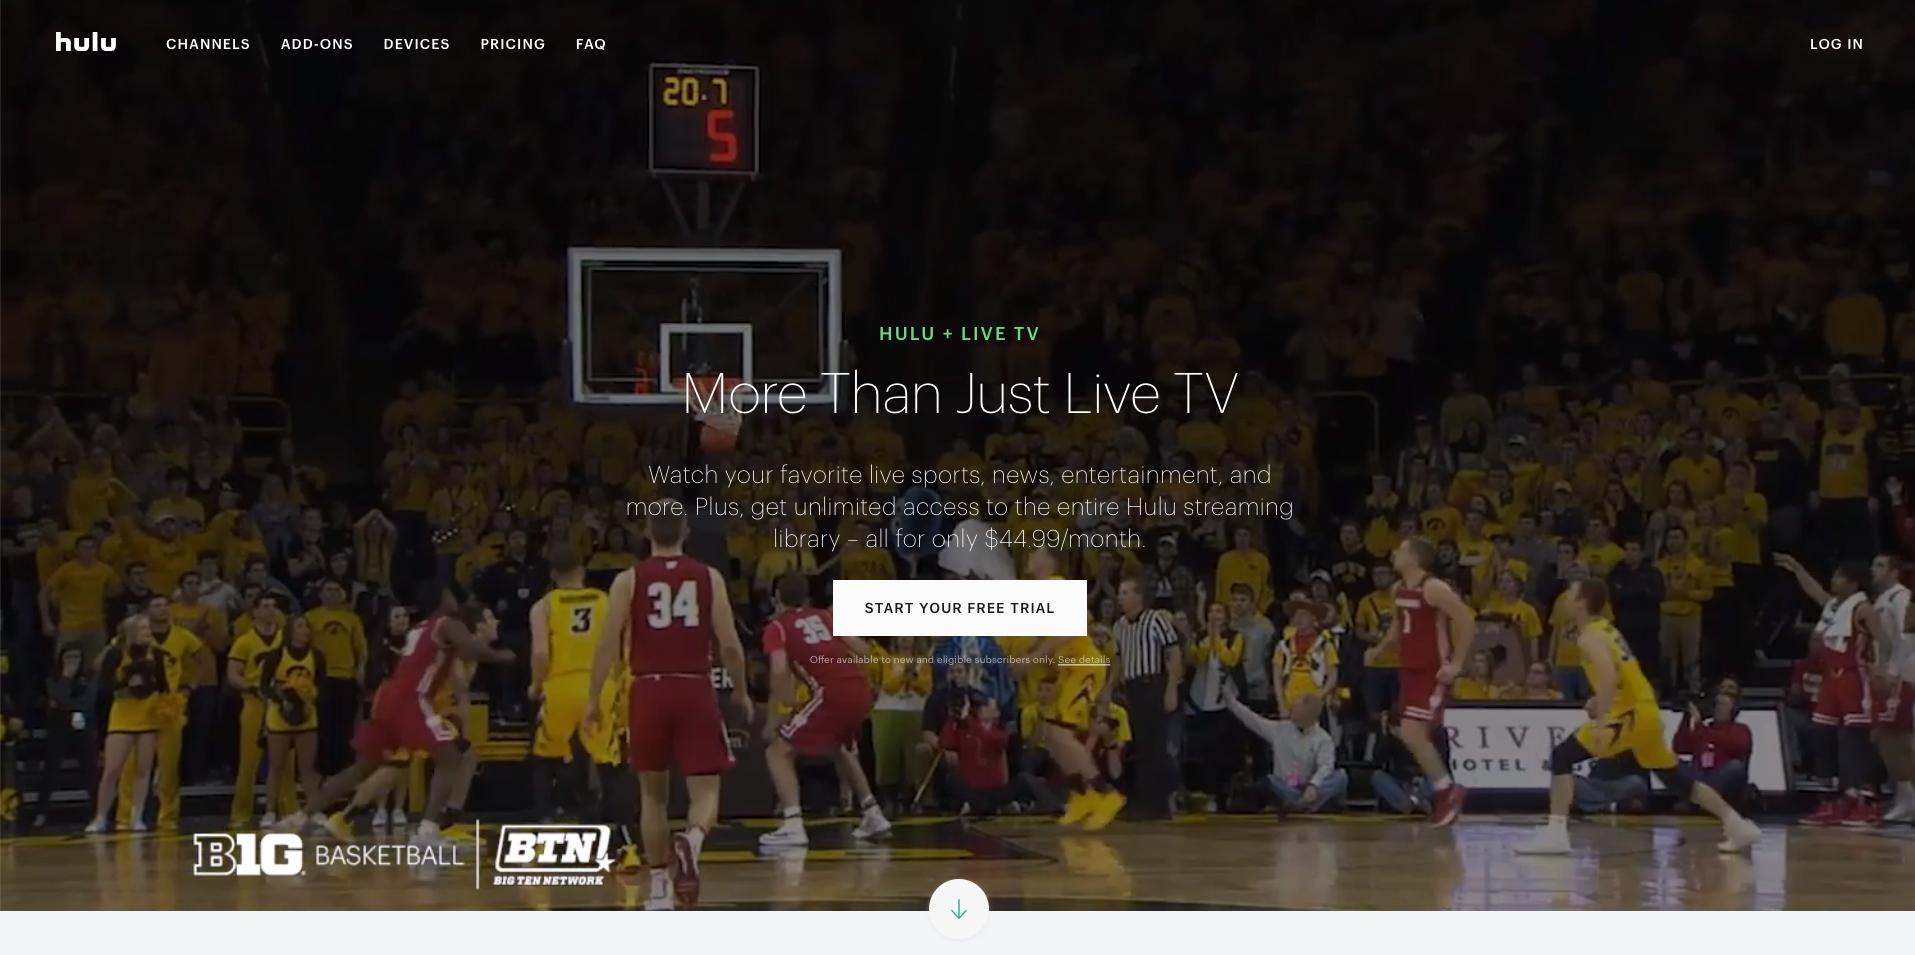 Hulu with Live TV simultaneous streams